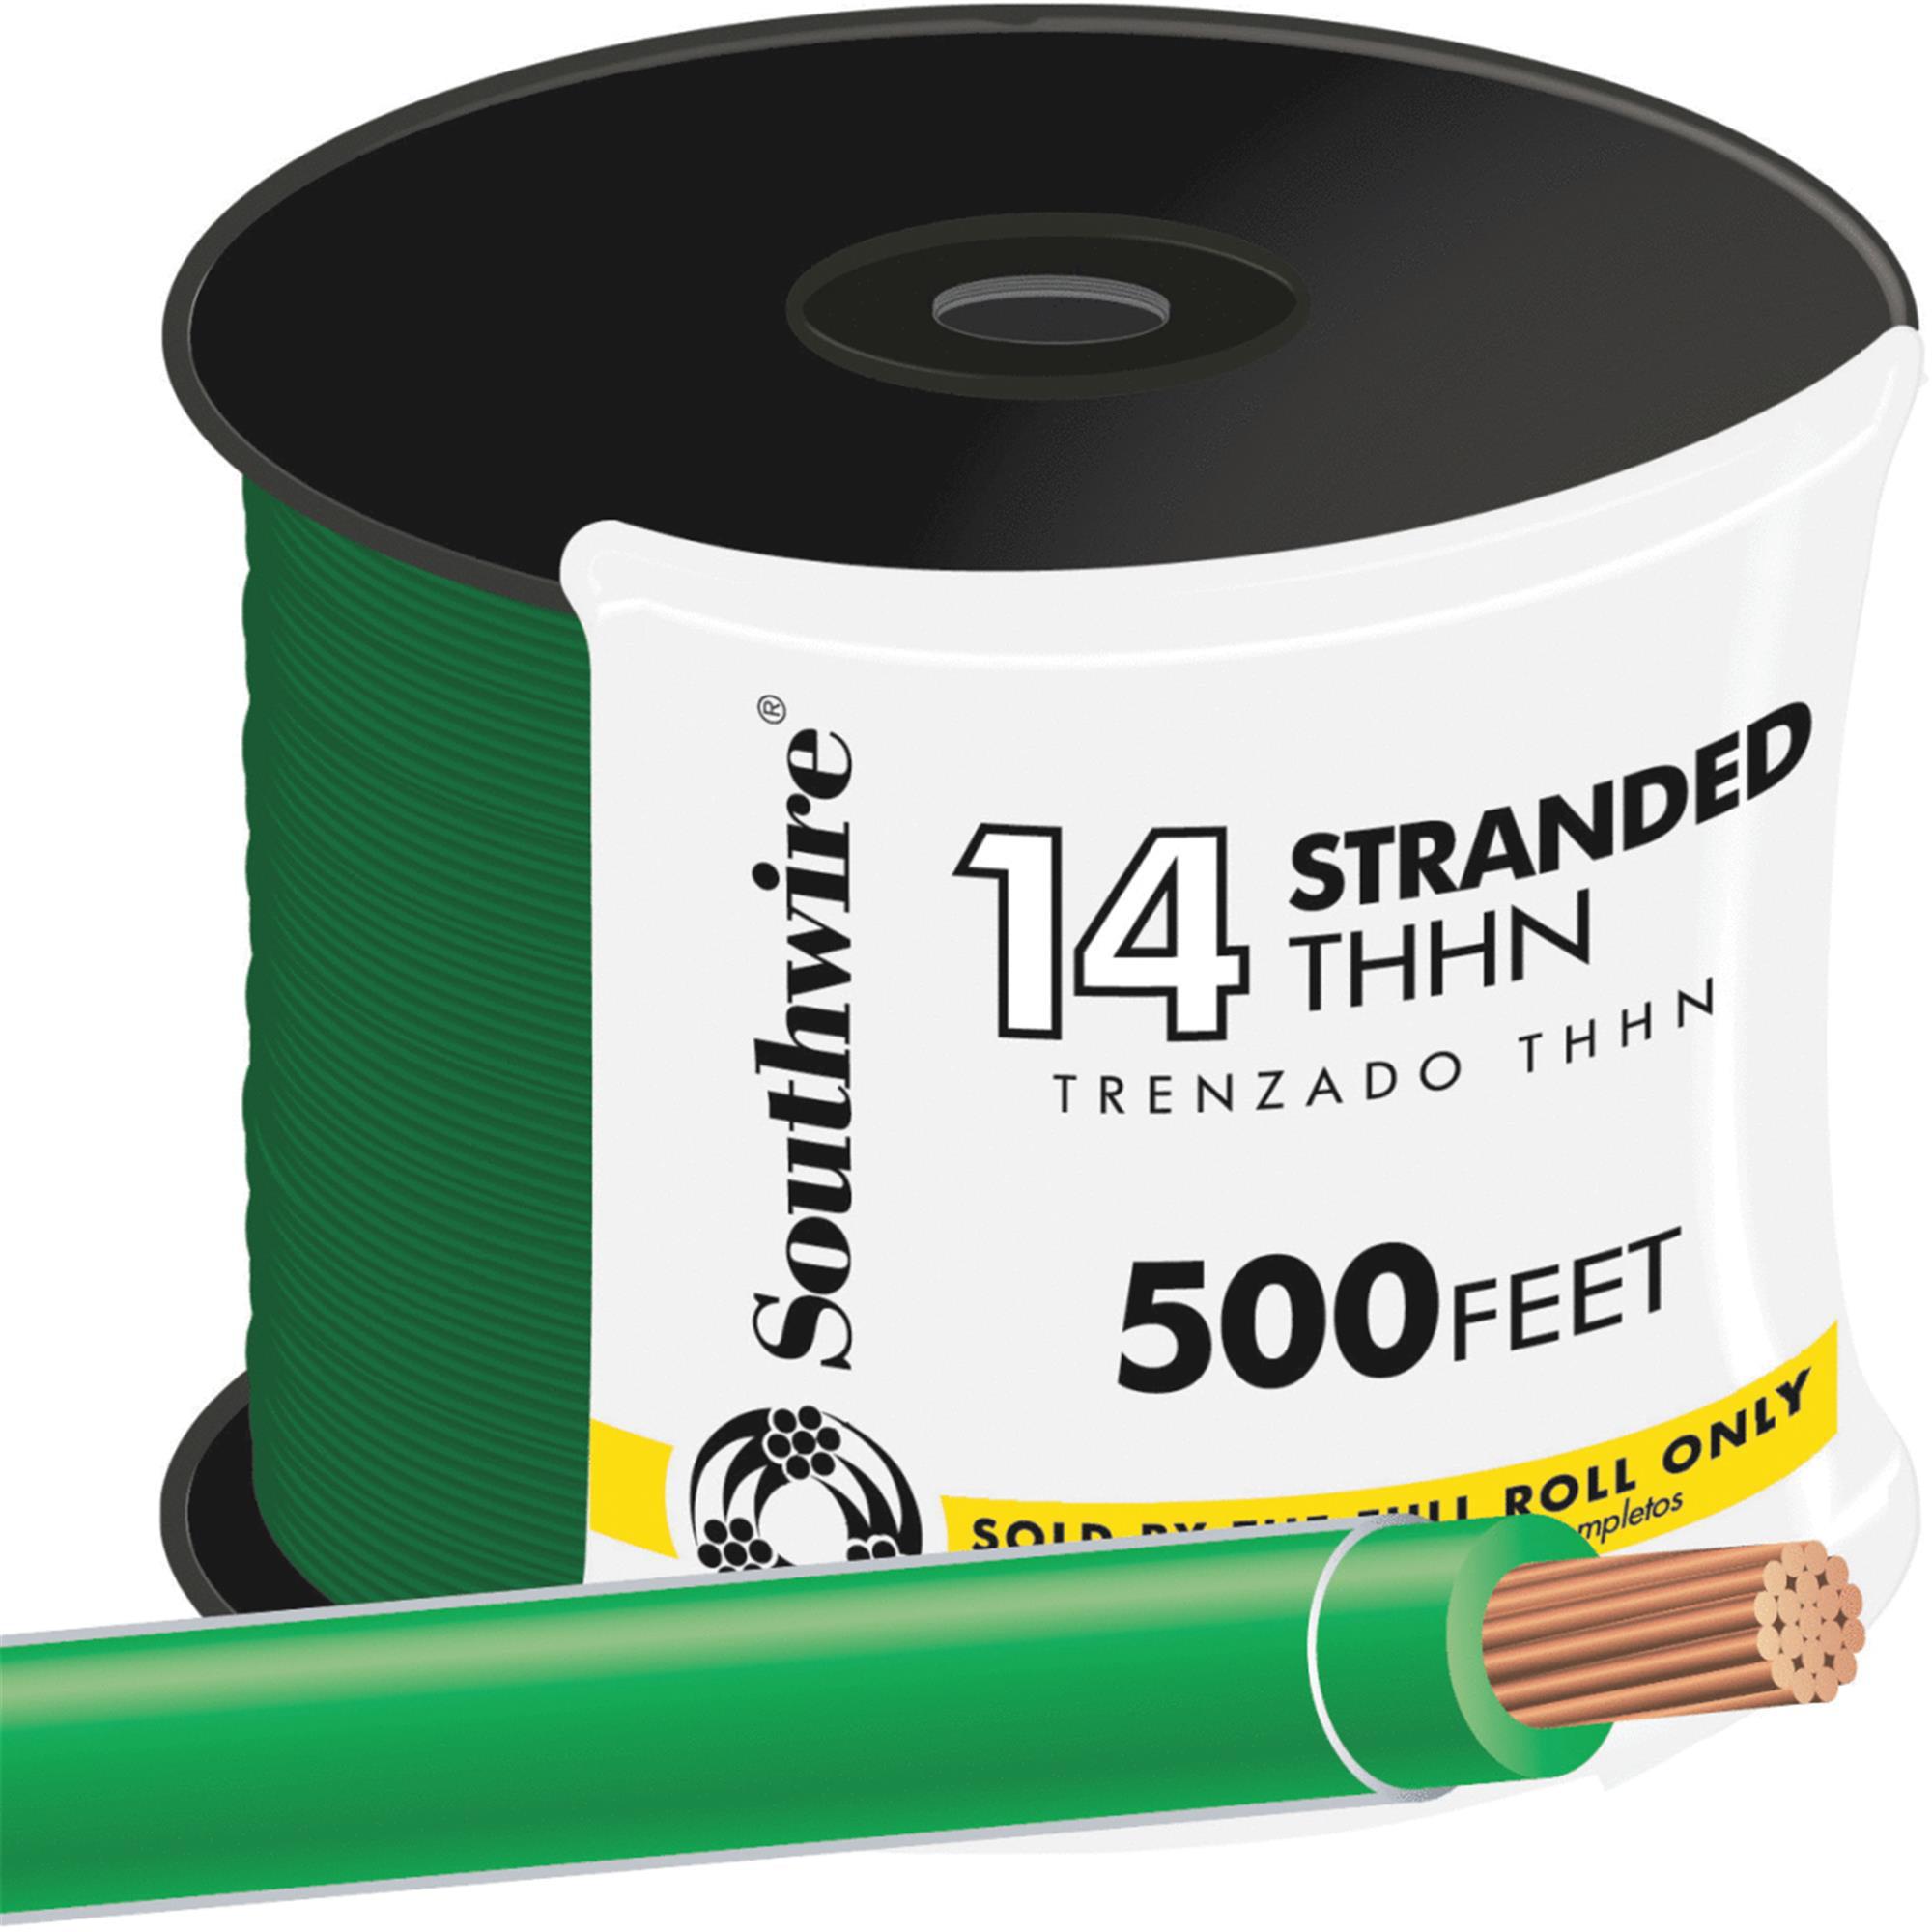 Southwire 500' 14str Green Thhn Wire 22959158